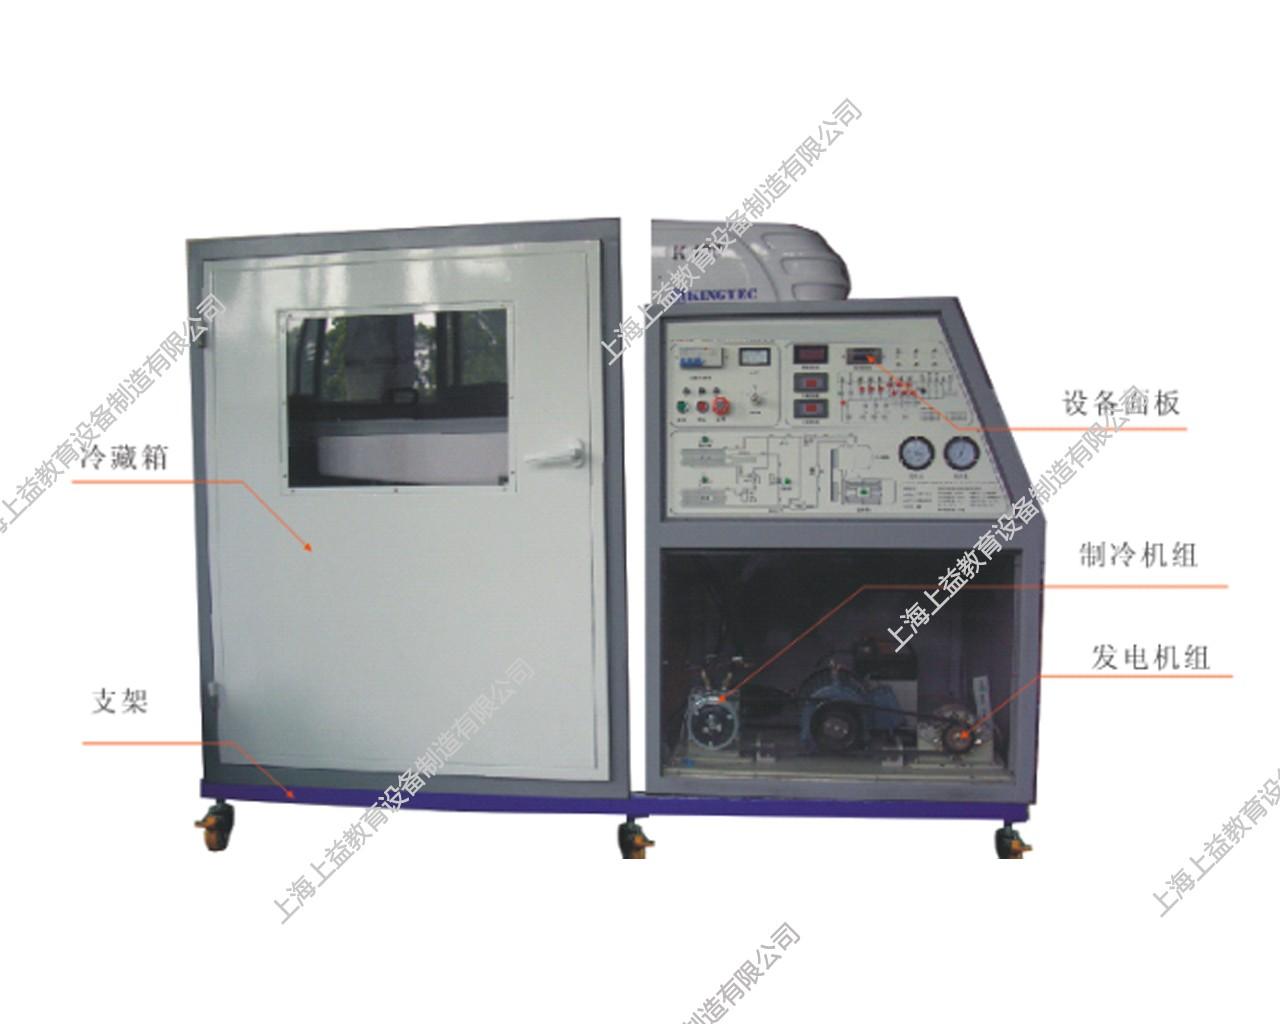 SYJD-08G冷藏车制冷系统wwwlehu8vip装置